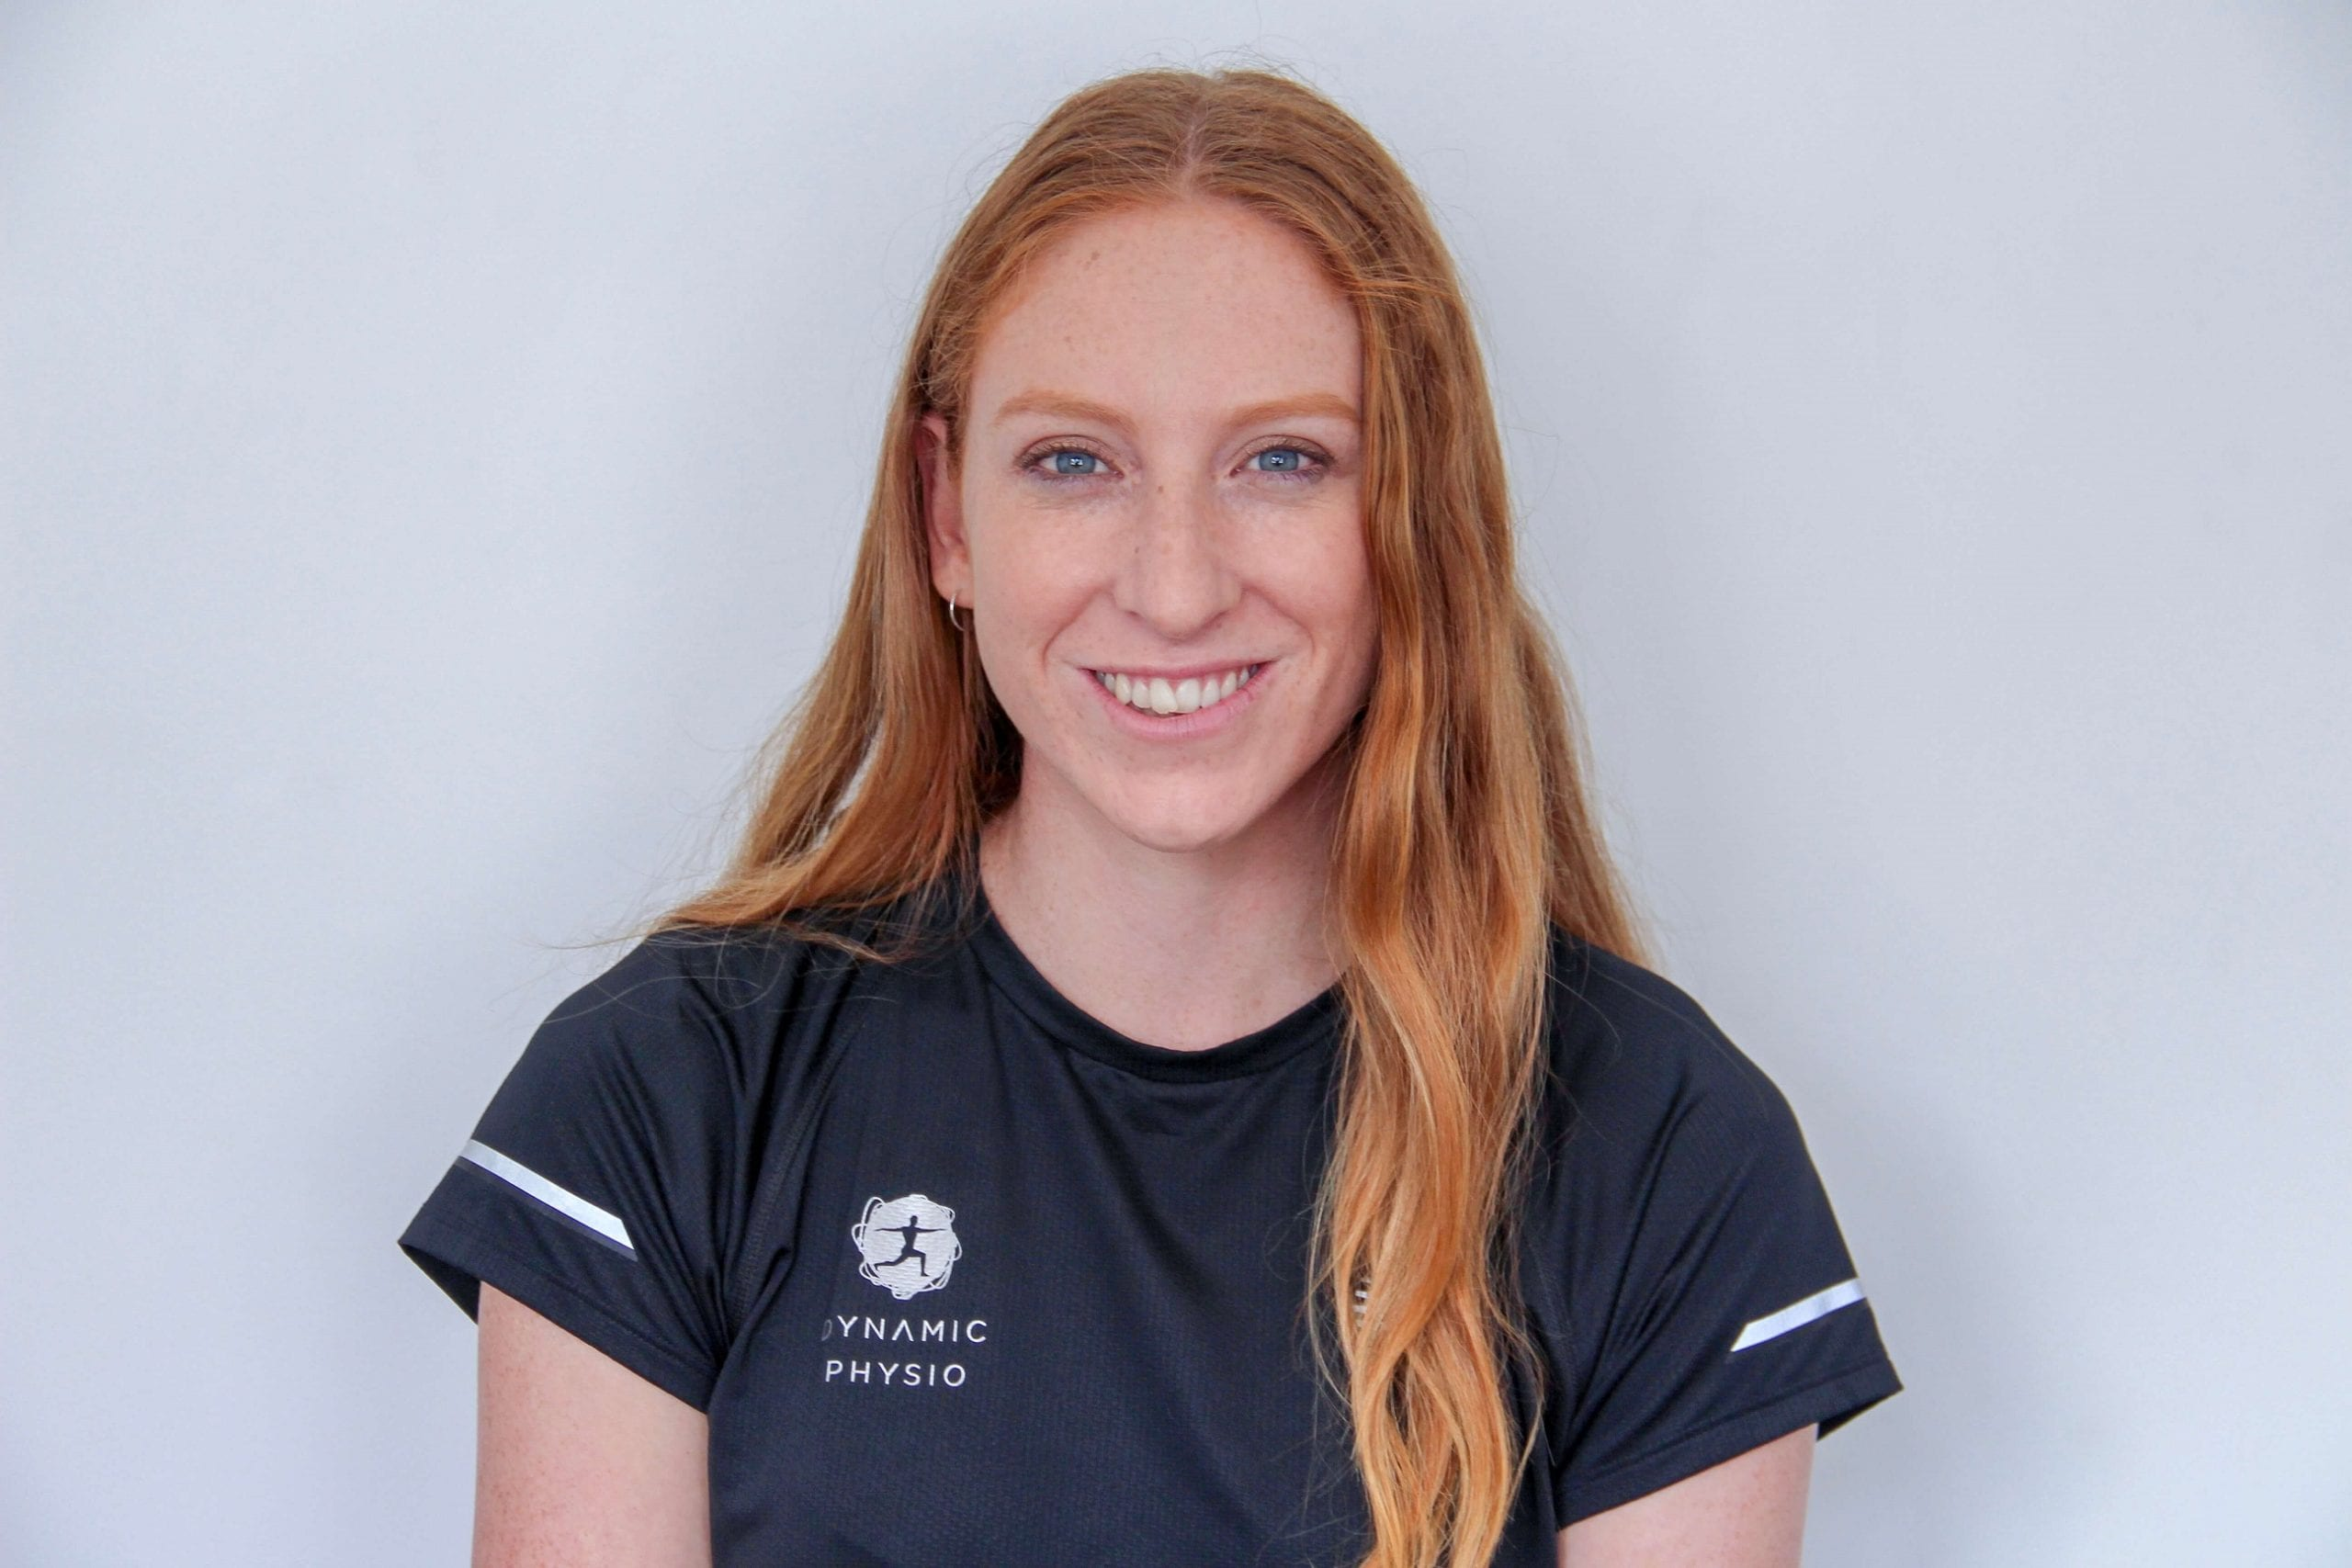 Chelsea Jeffries - Physiotherapist